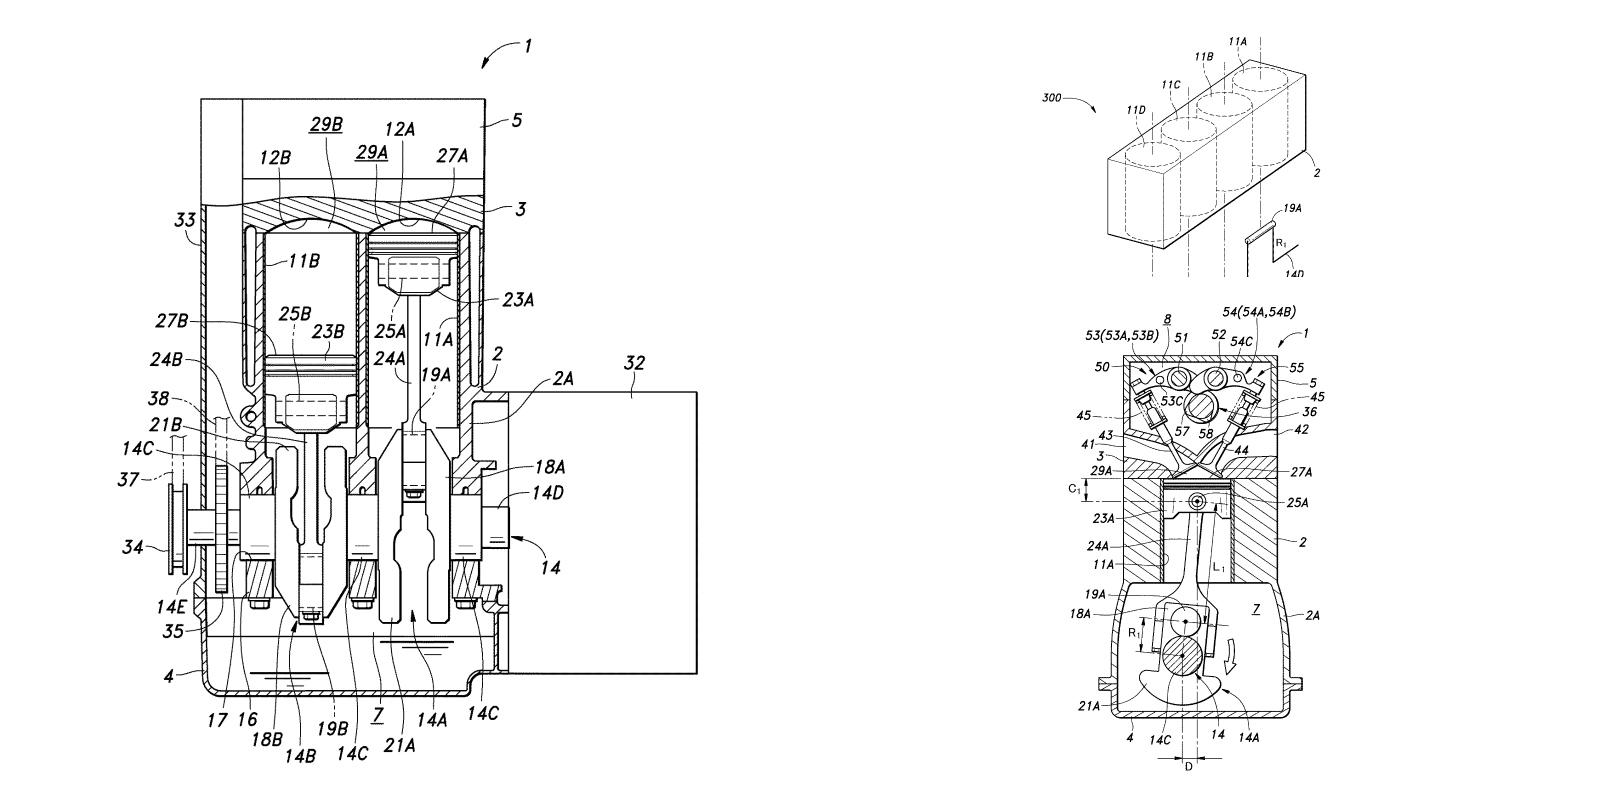 chrysler crossfire wiring diagrams bmw e61 diagram 2004 fuse box